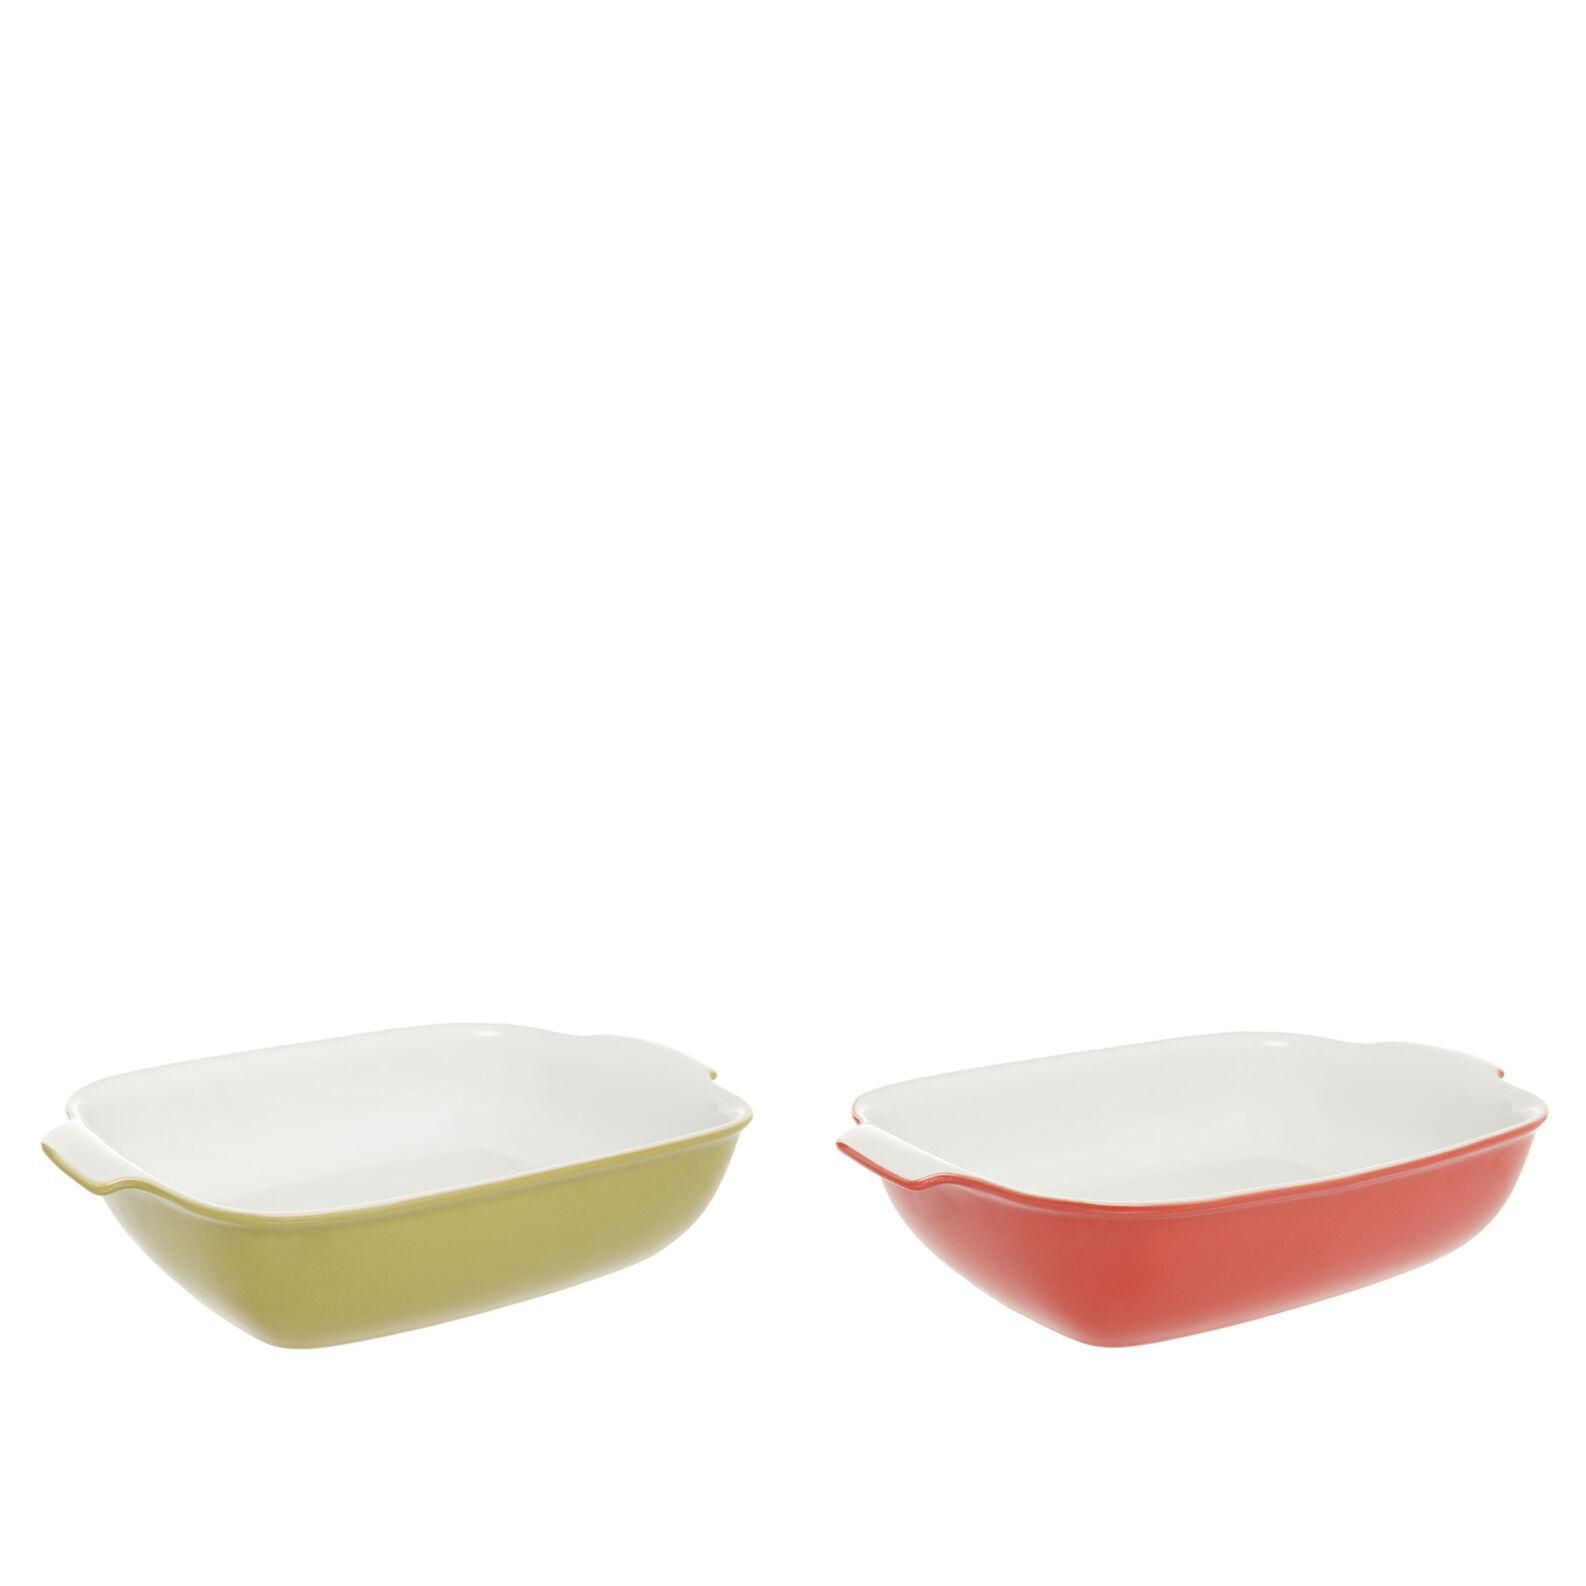 Coloured ceramic oven dish